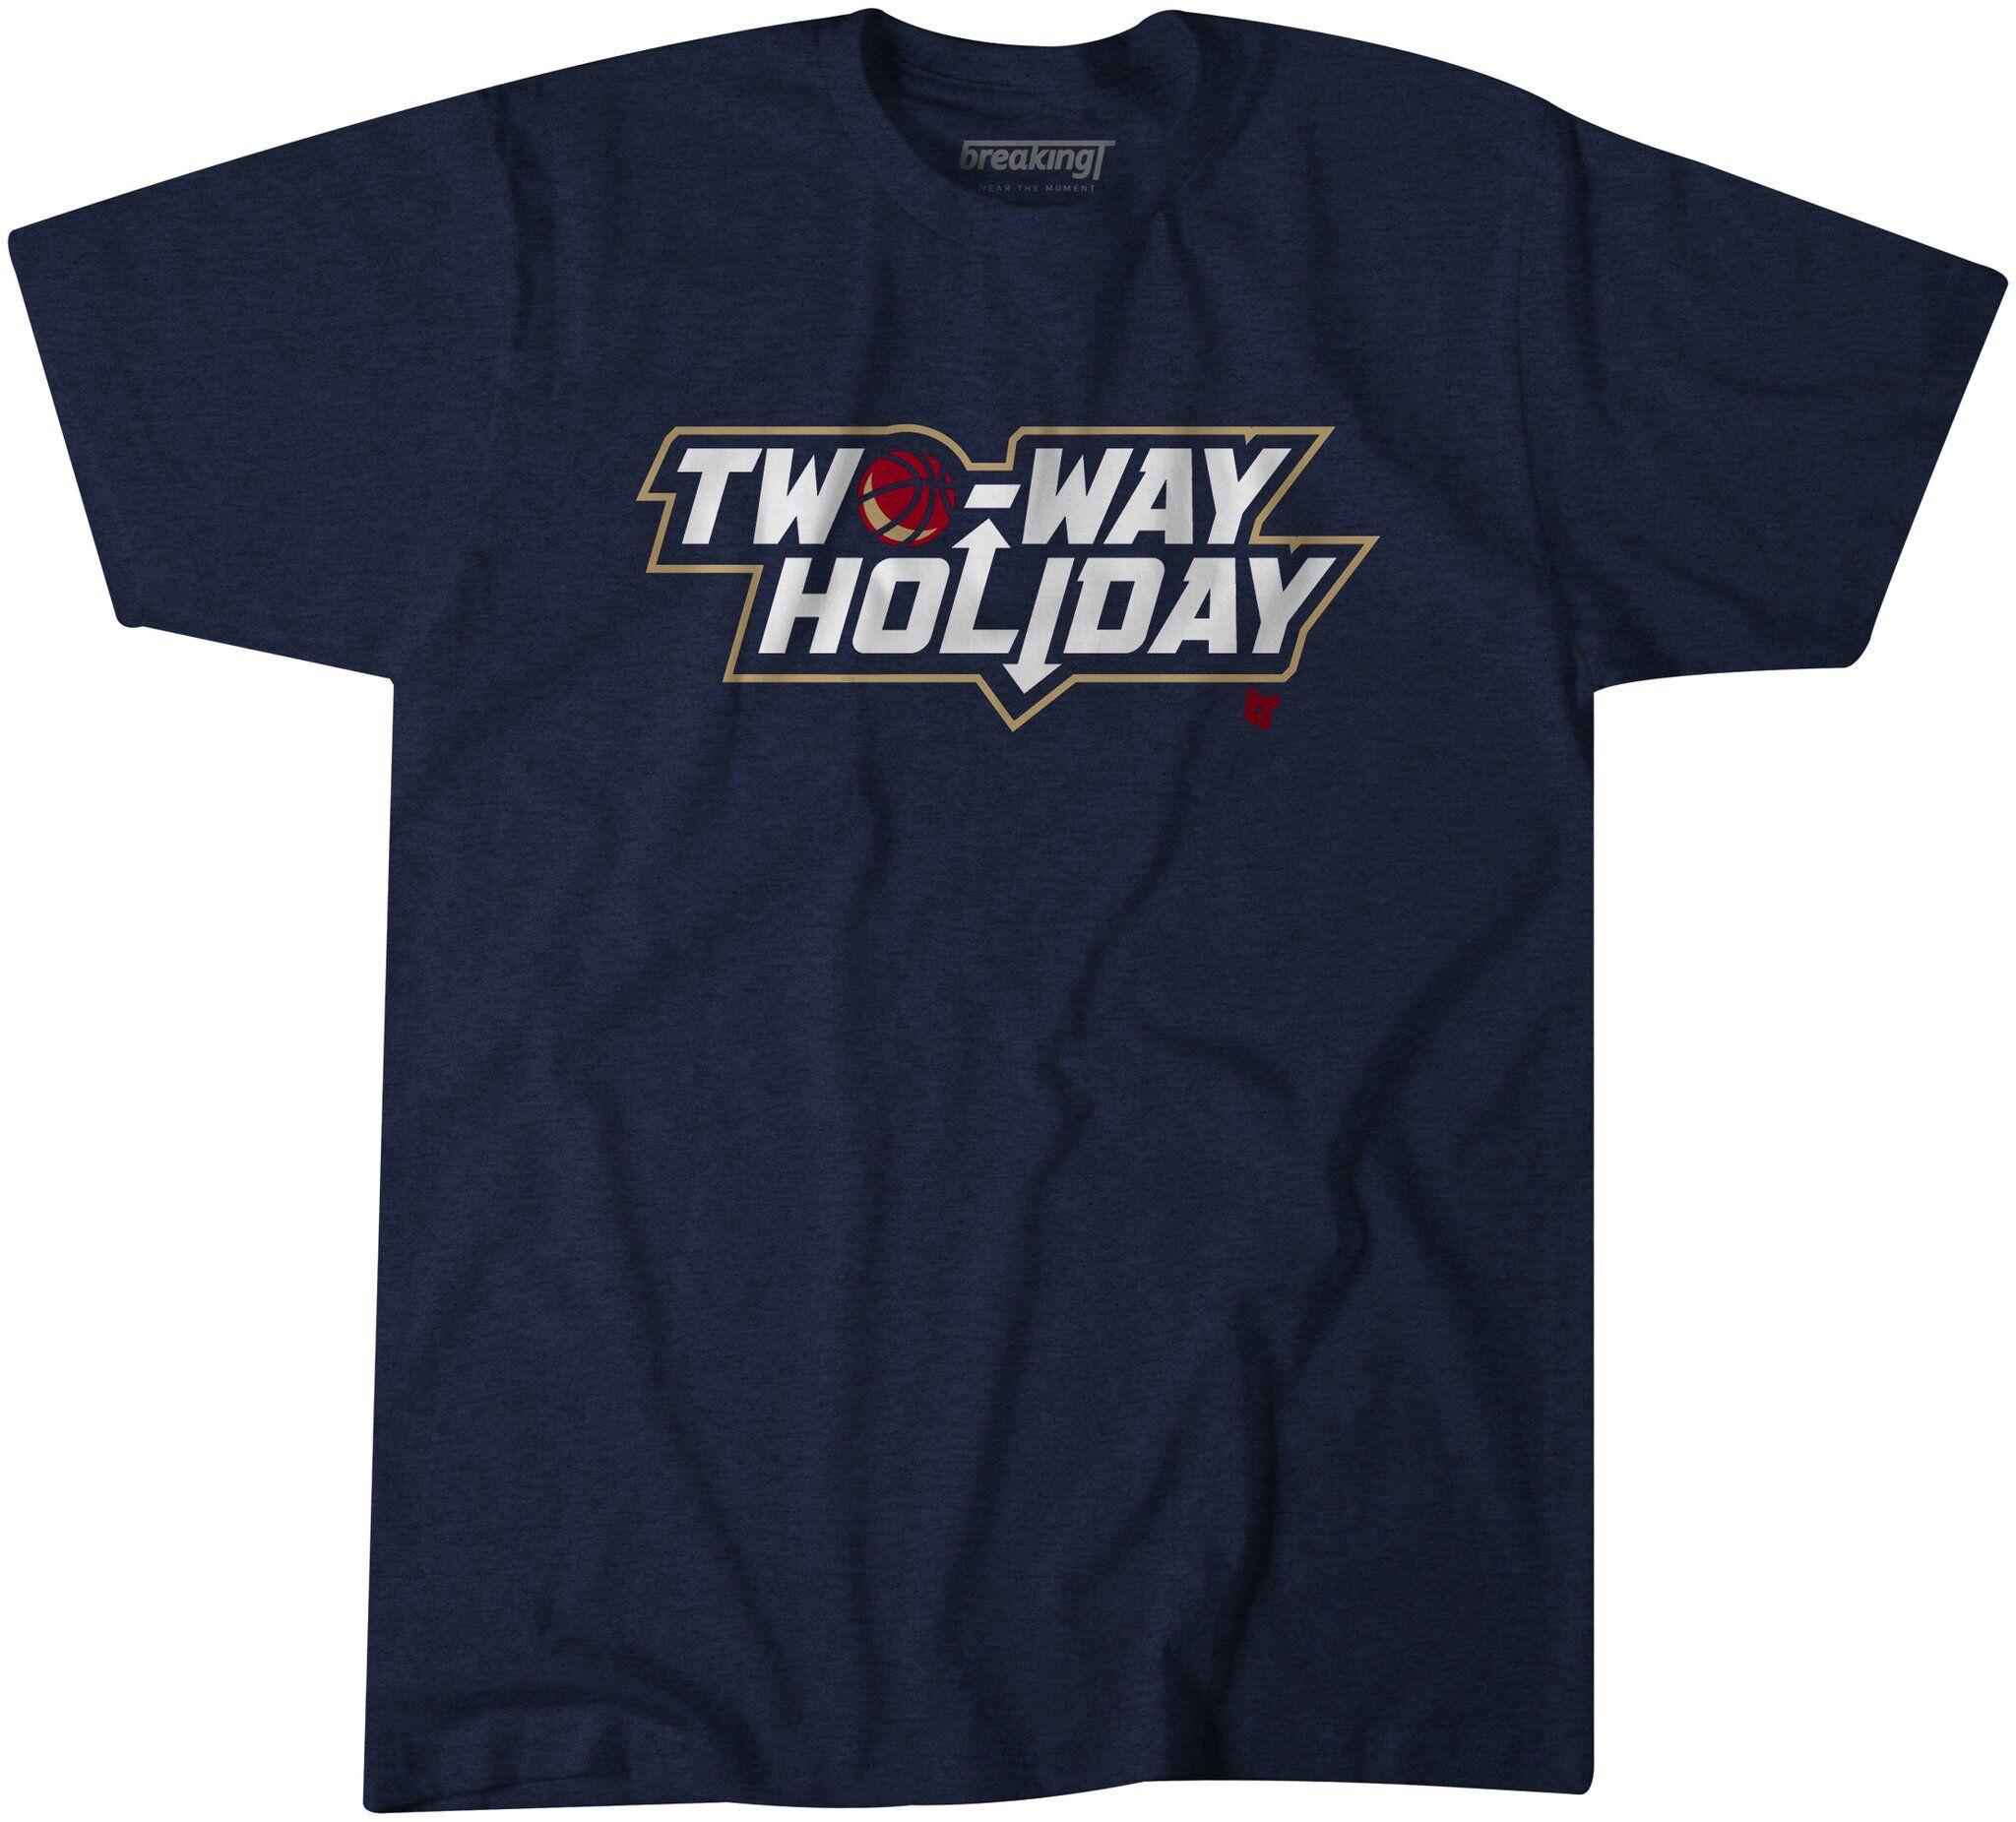 Twowayholiday_jrueholiday_t450_breakingt_shirt_2048x2048